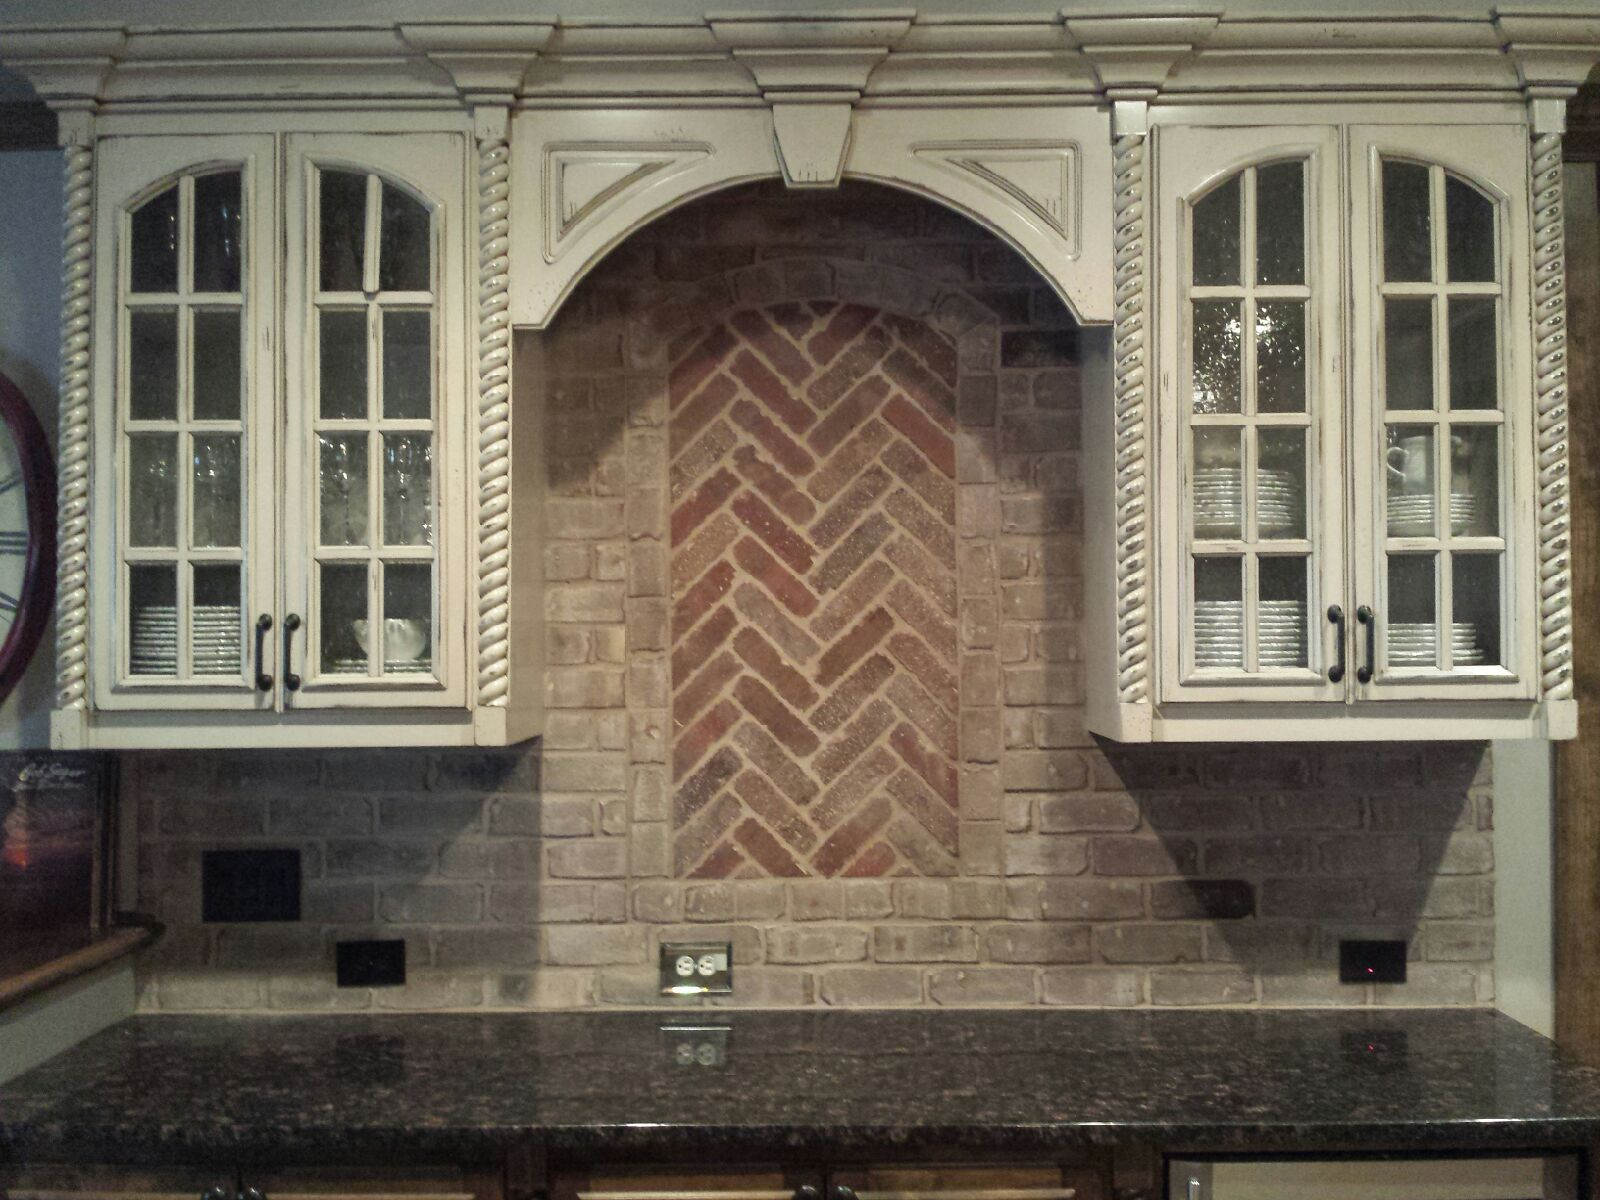 Ferentino Tile Design Inc image 3